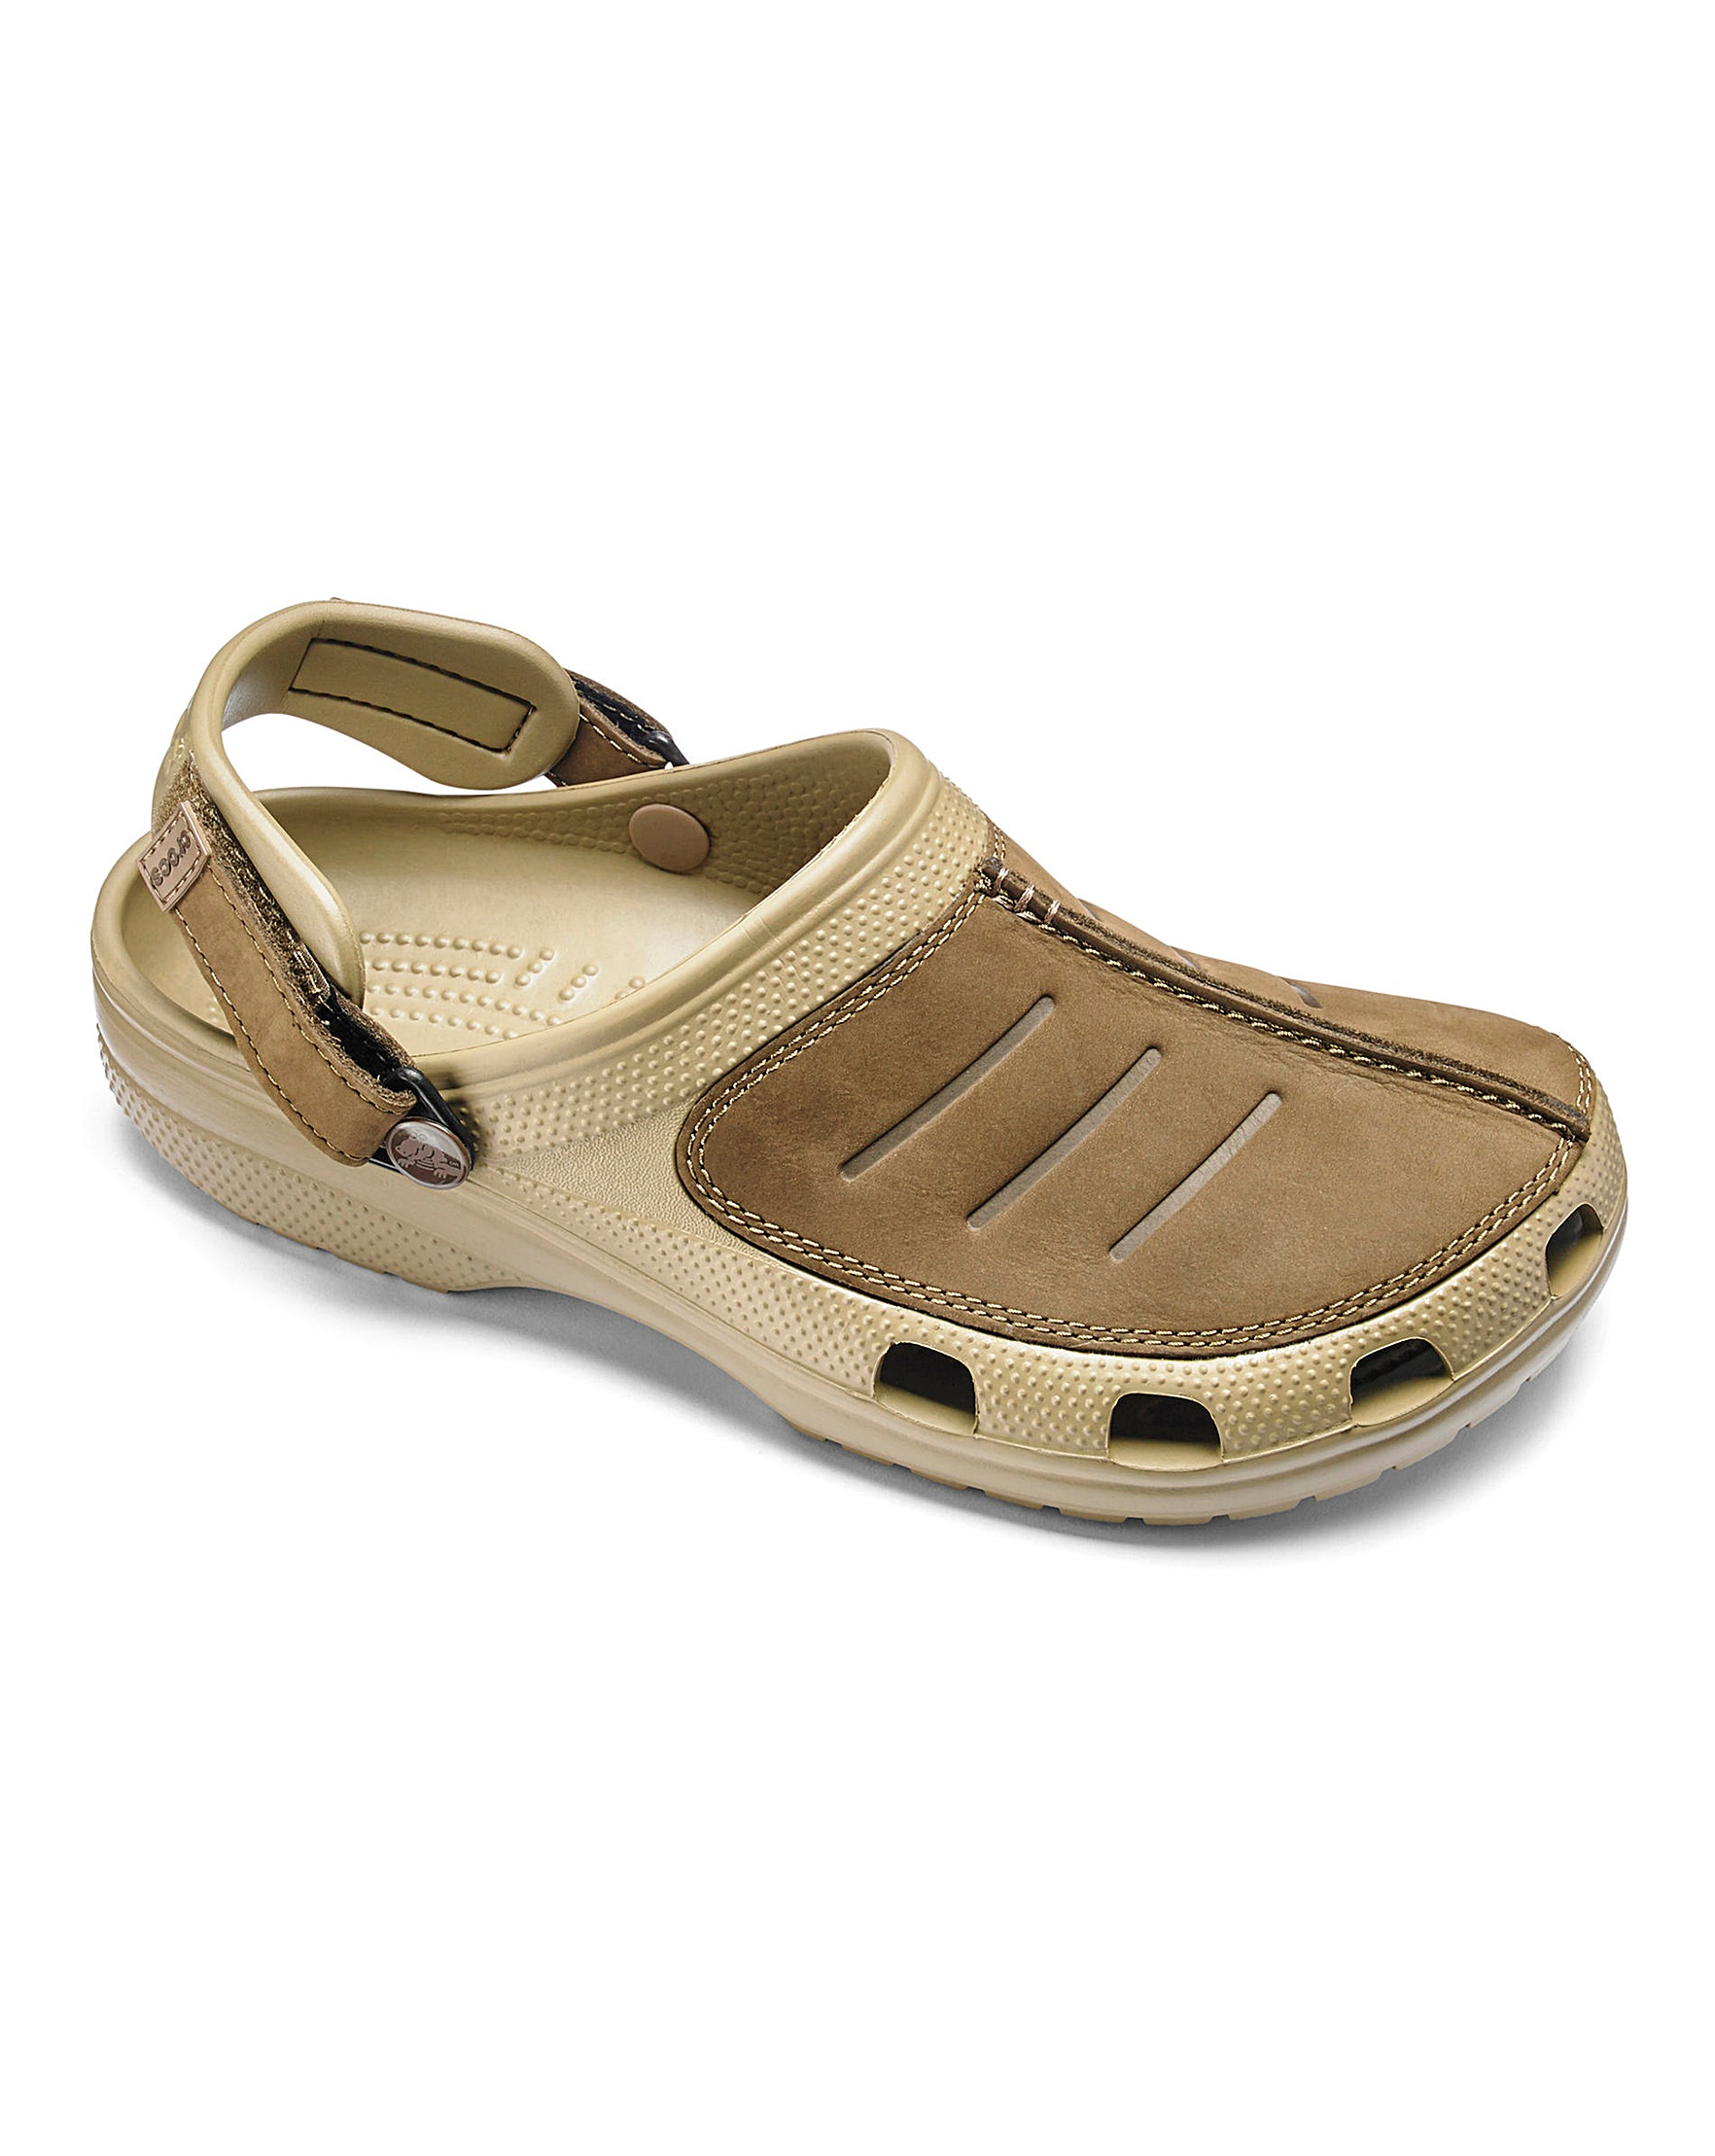 meilleures baskets c04ba 00e9a Crocs Yukon Mesa Clog